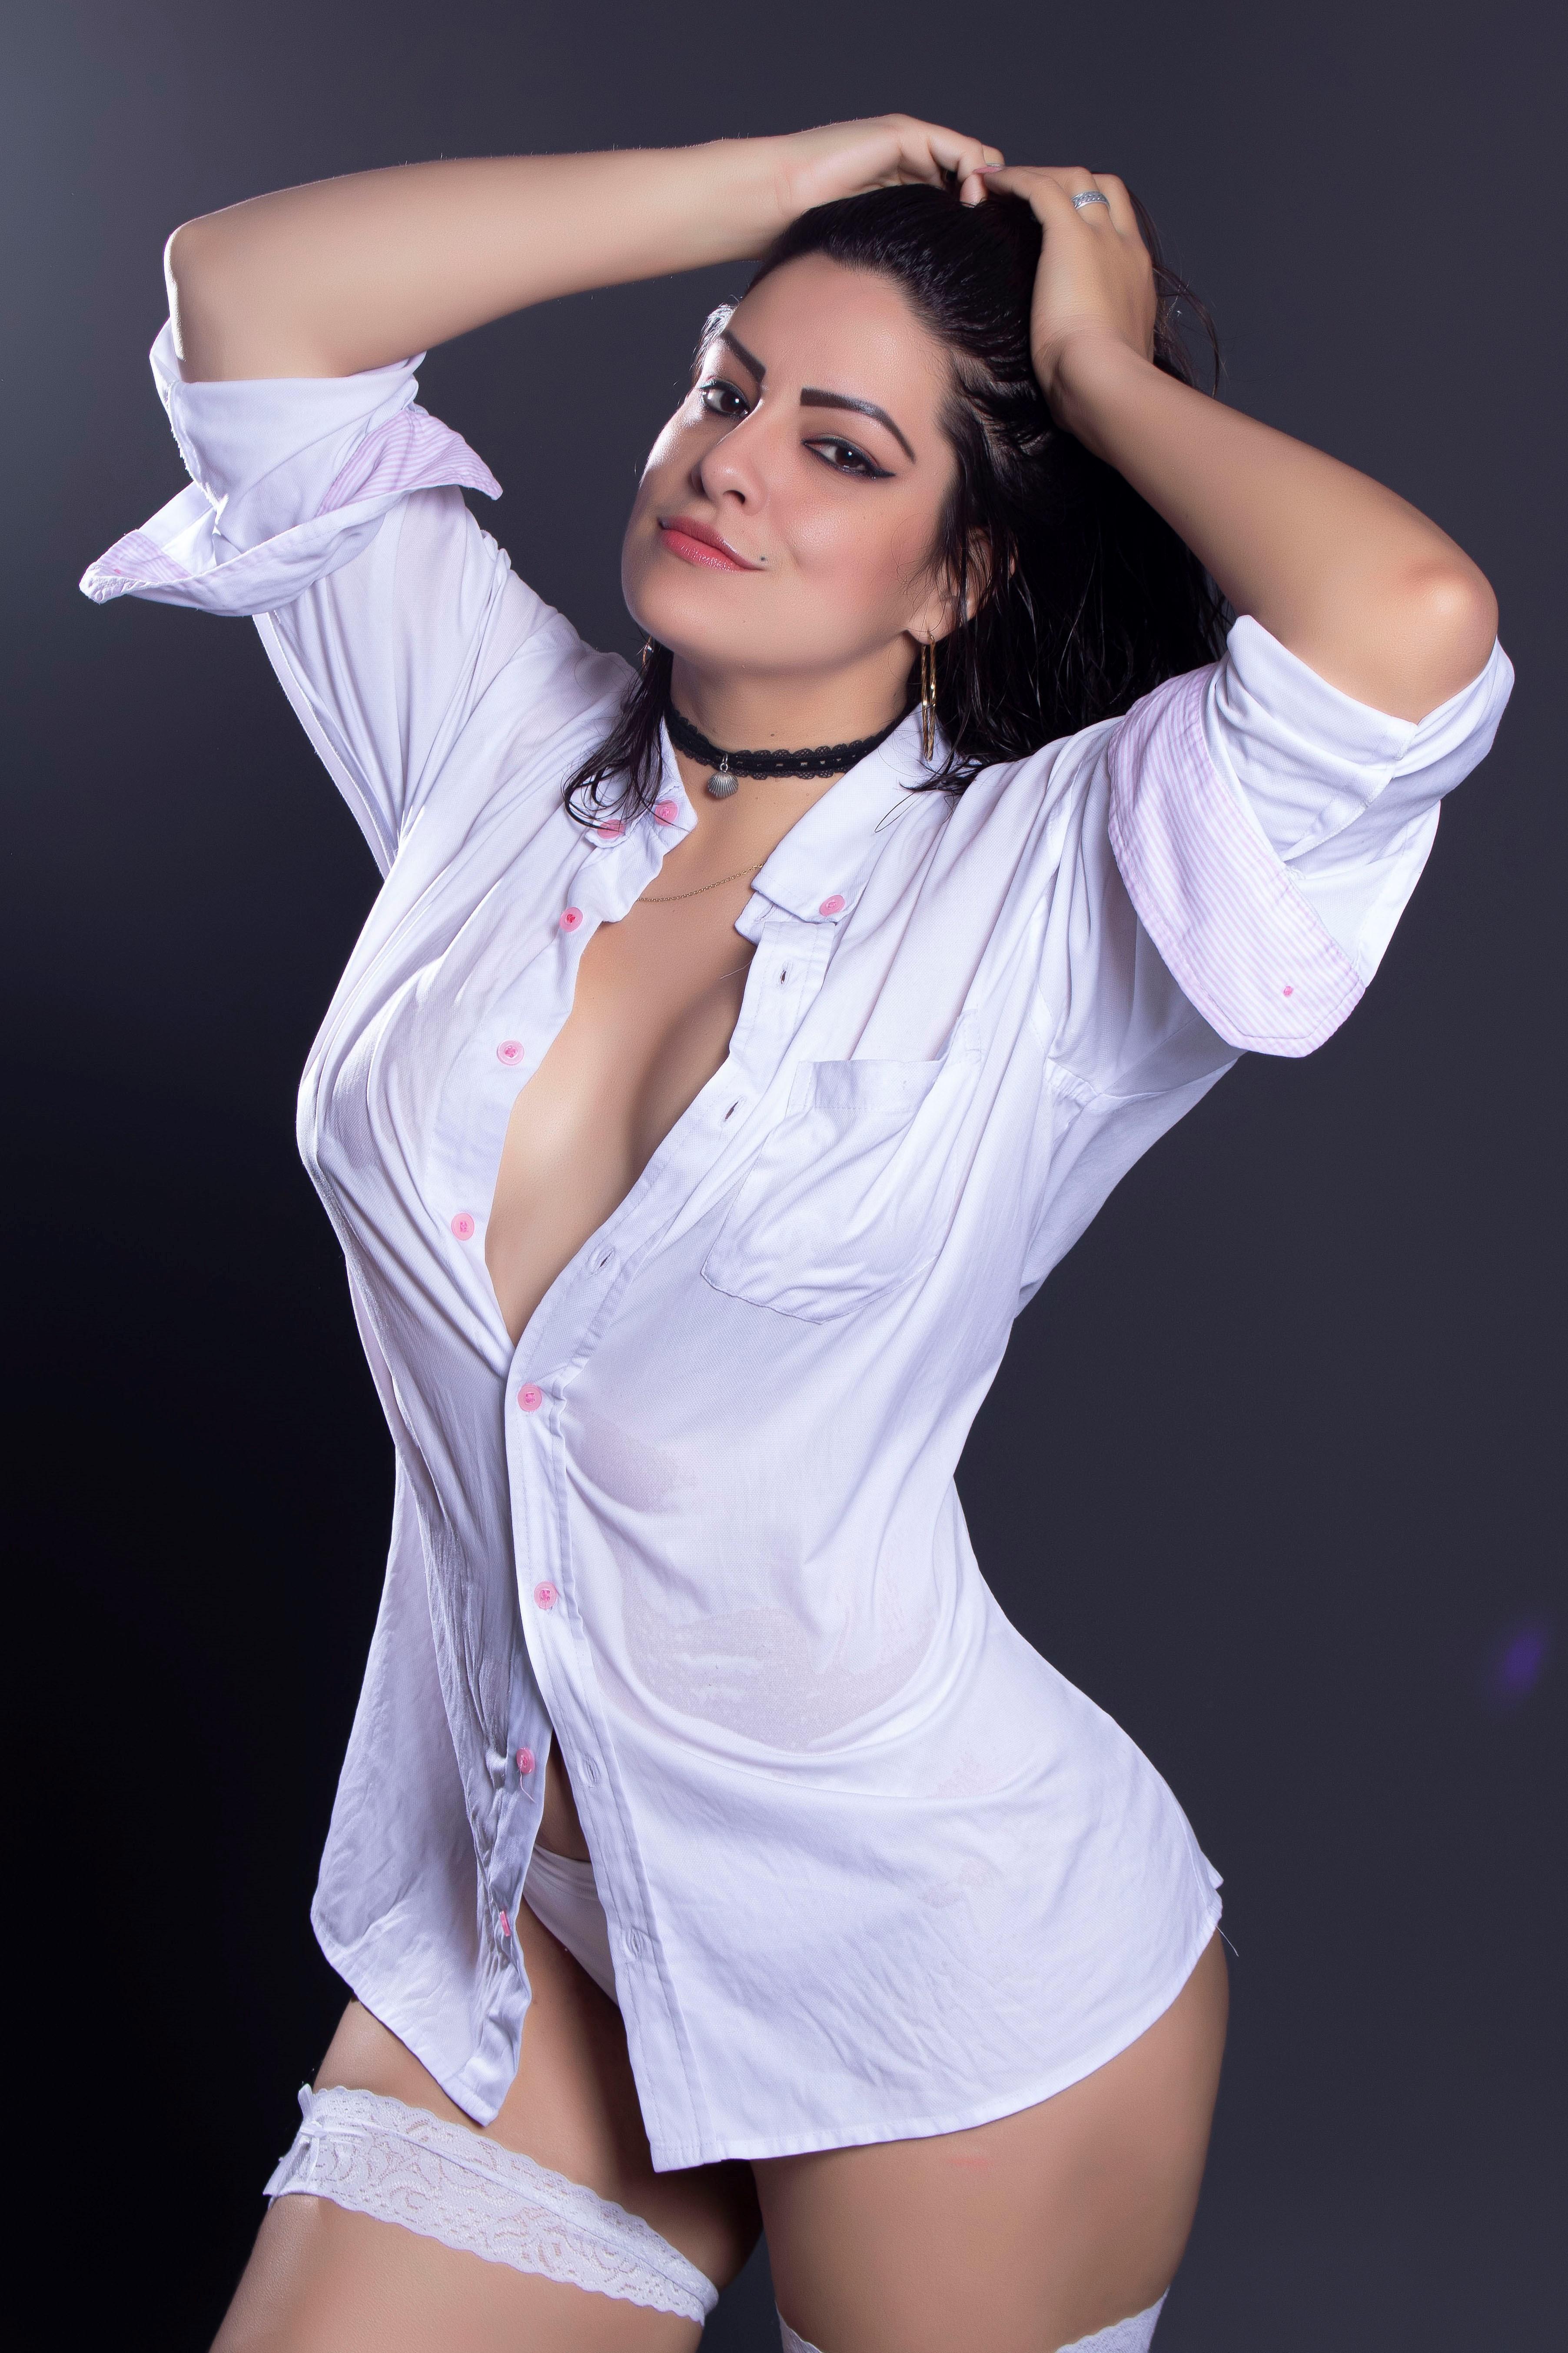 dominikánské MILF porno amatérské interracial paroháč filmy